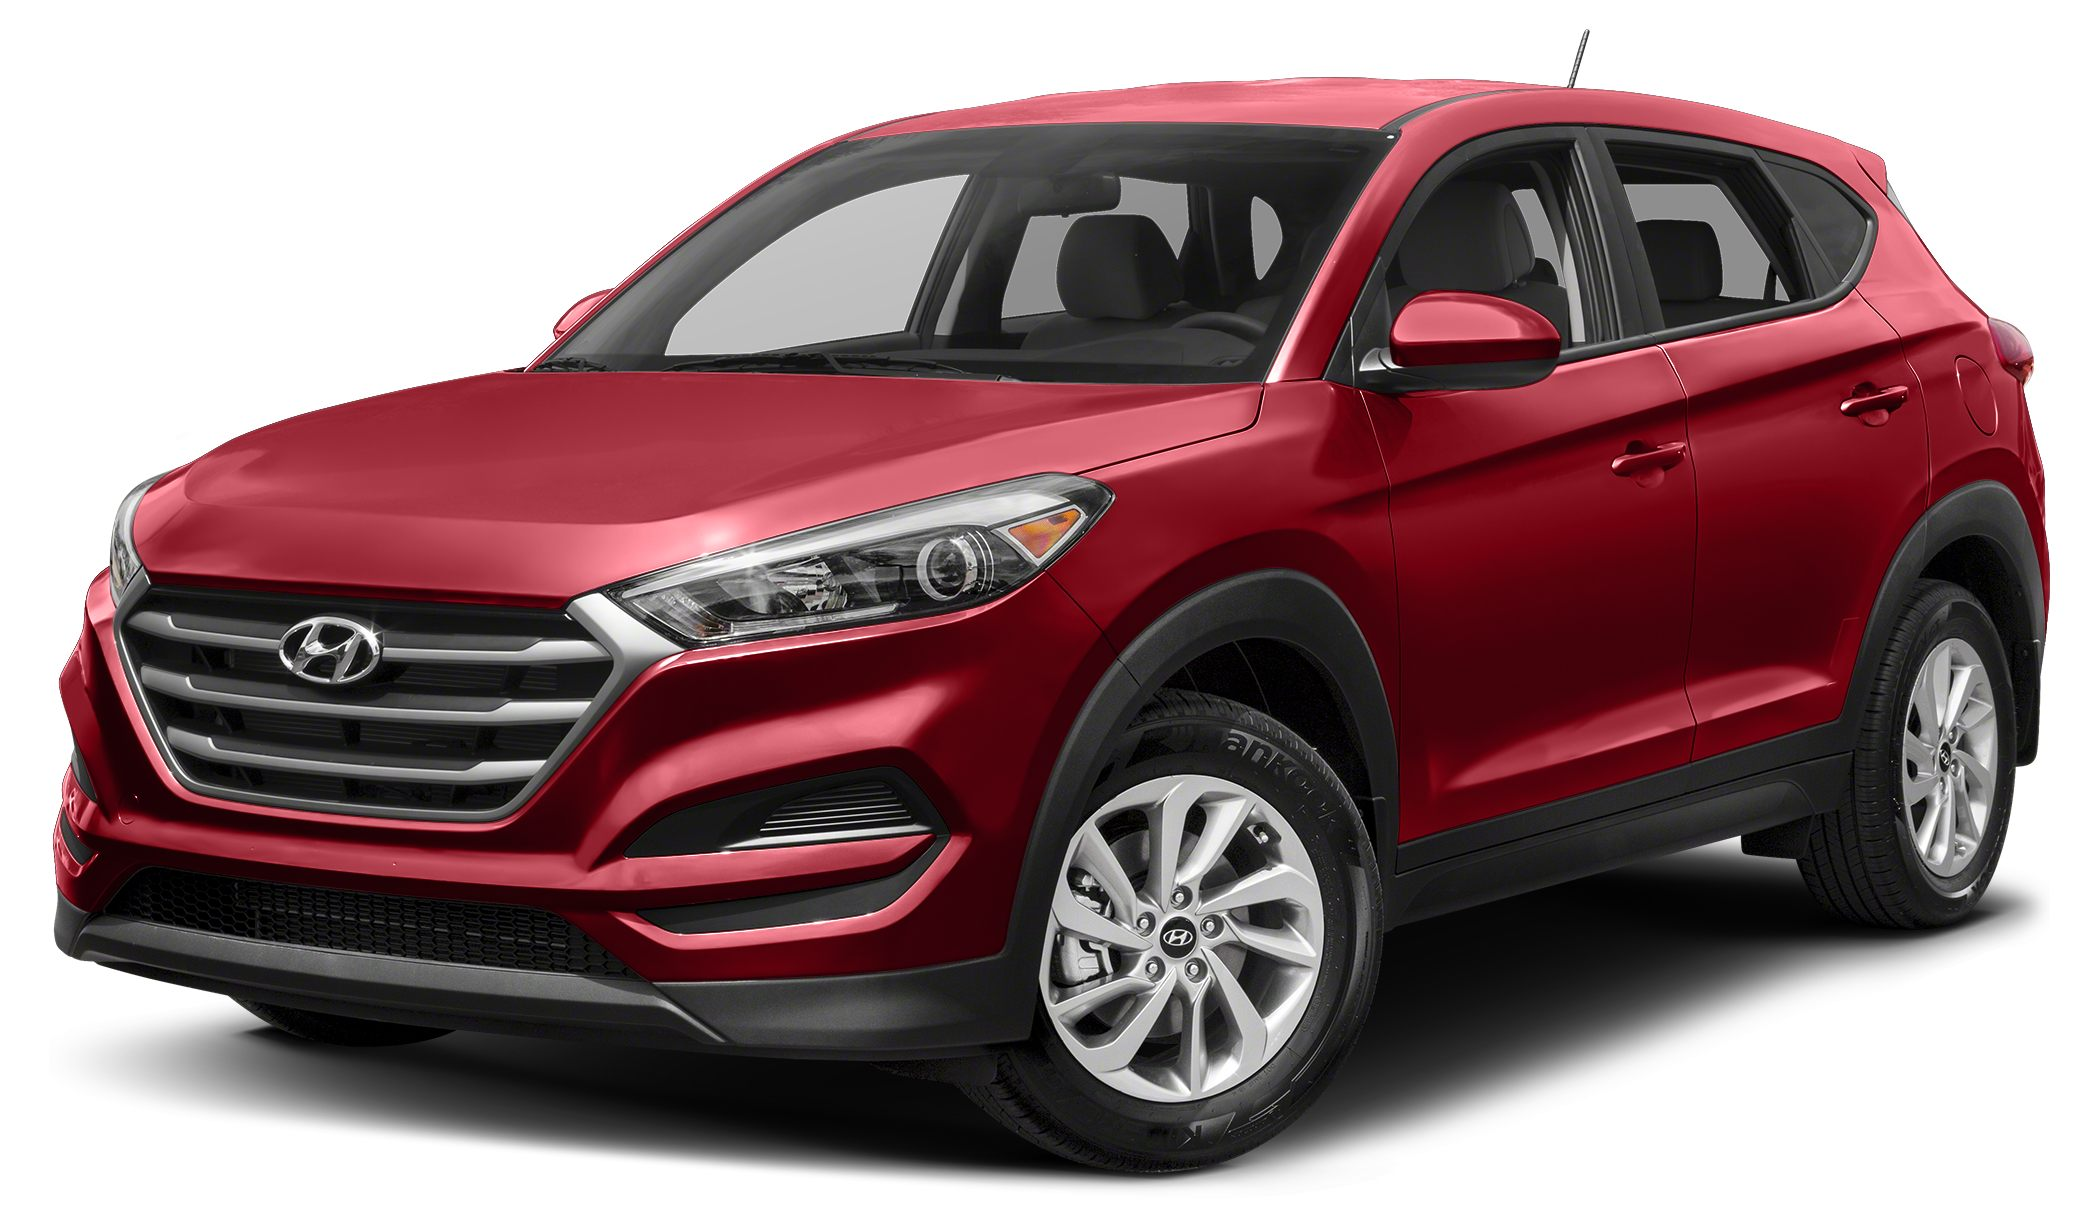 2017 Hyundai Tucson SE Plus New Arrival This 2017 Hyundai Tucson SE Plus will sell fast This Tuc